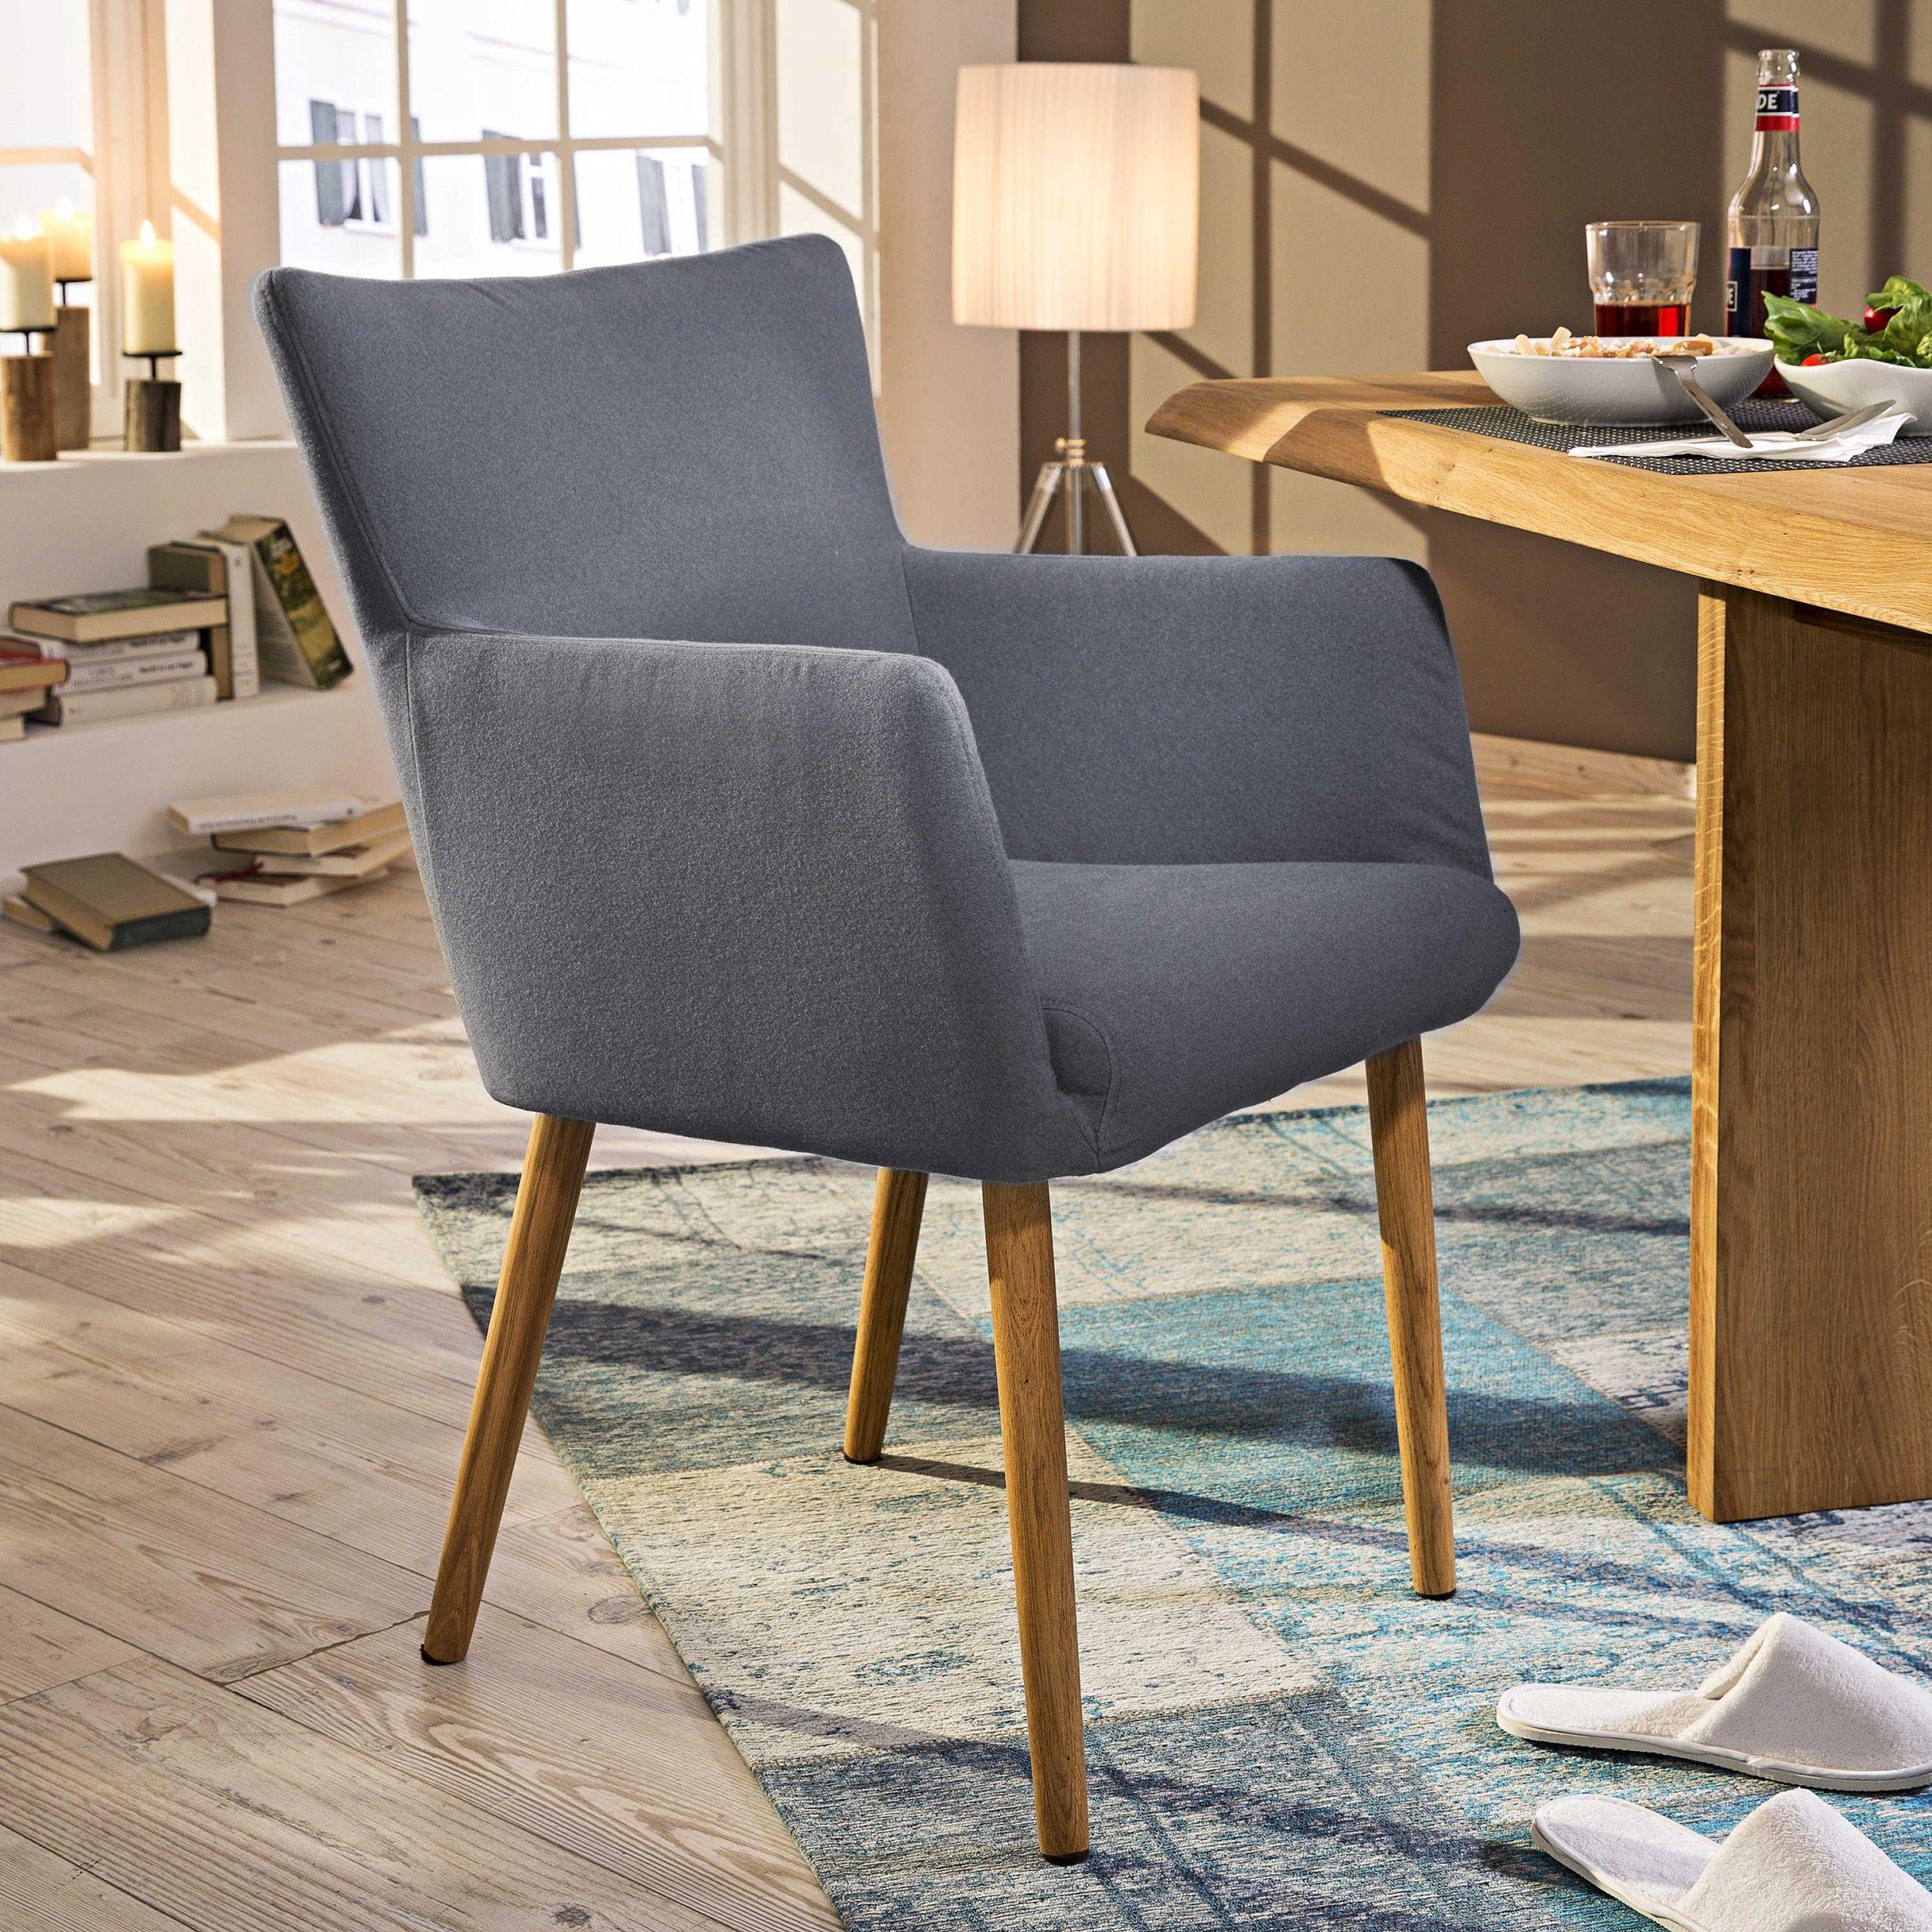 Stuhl Lamole 4 Fuß Stühle Stühle & Freischwinger